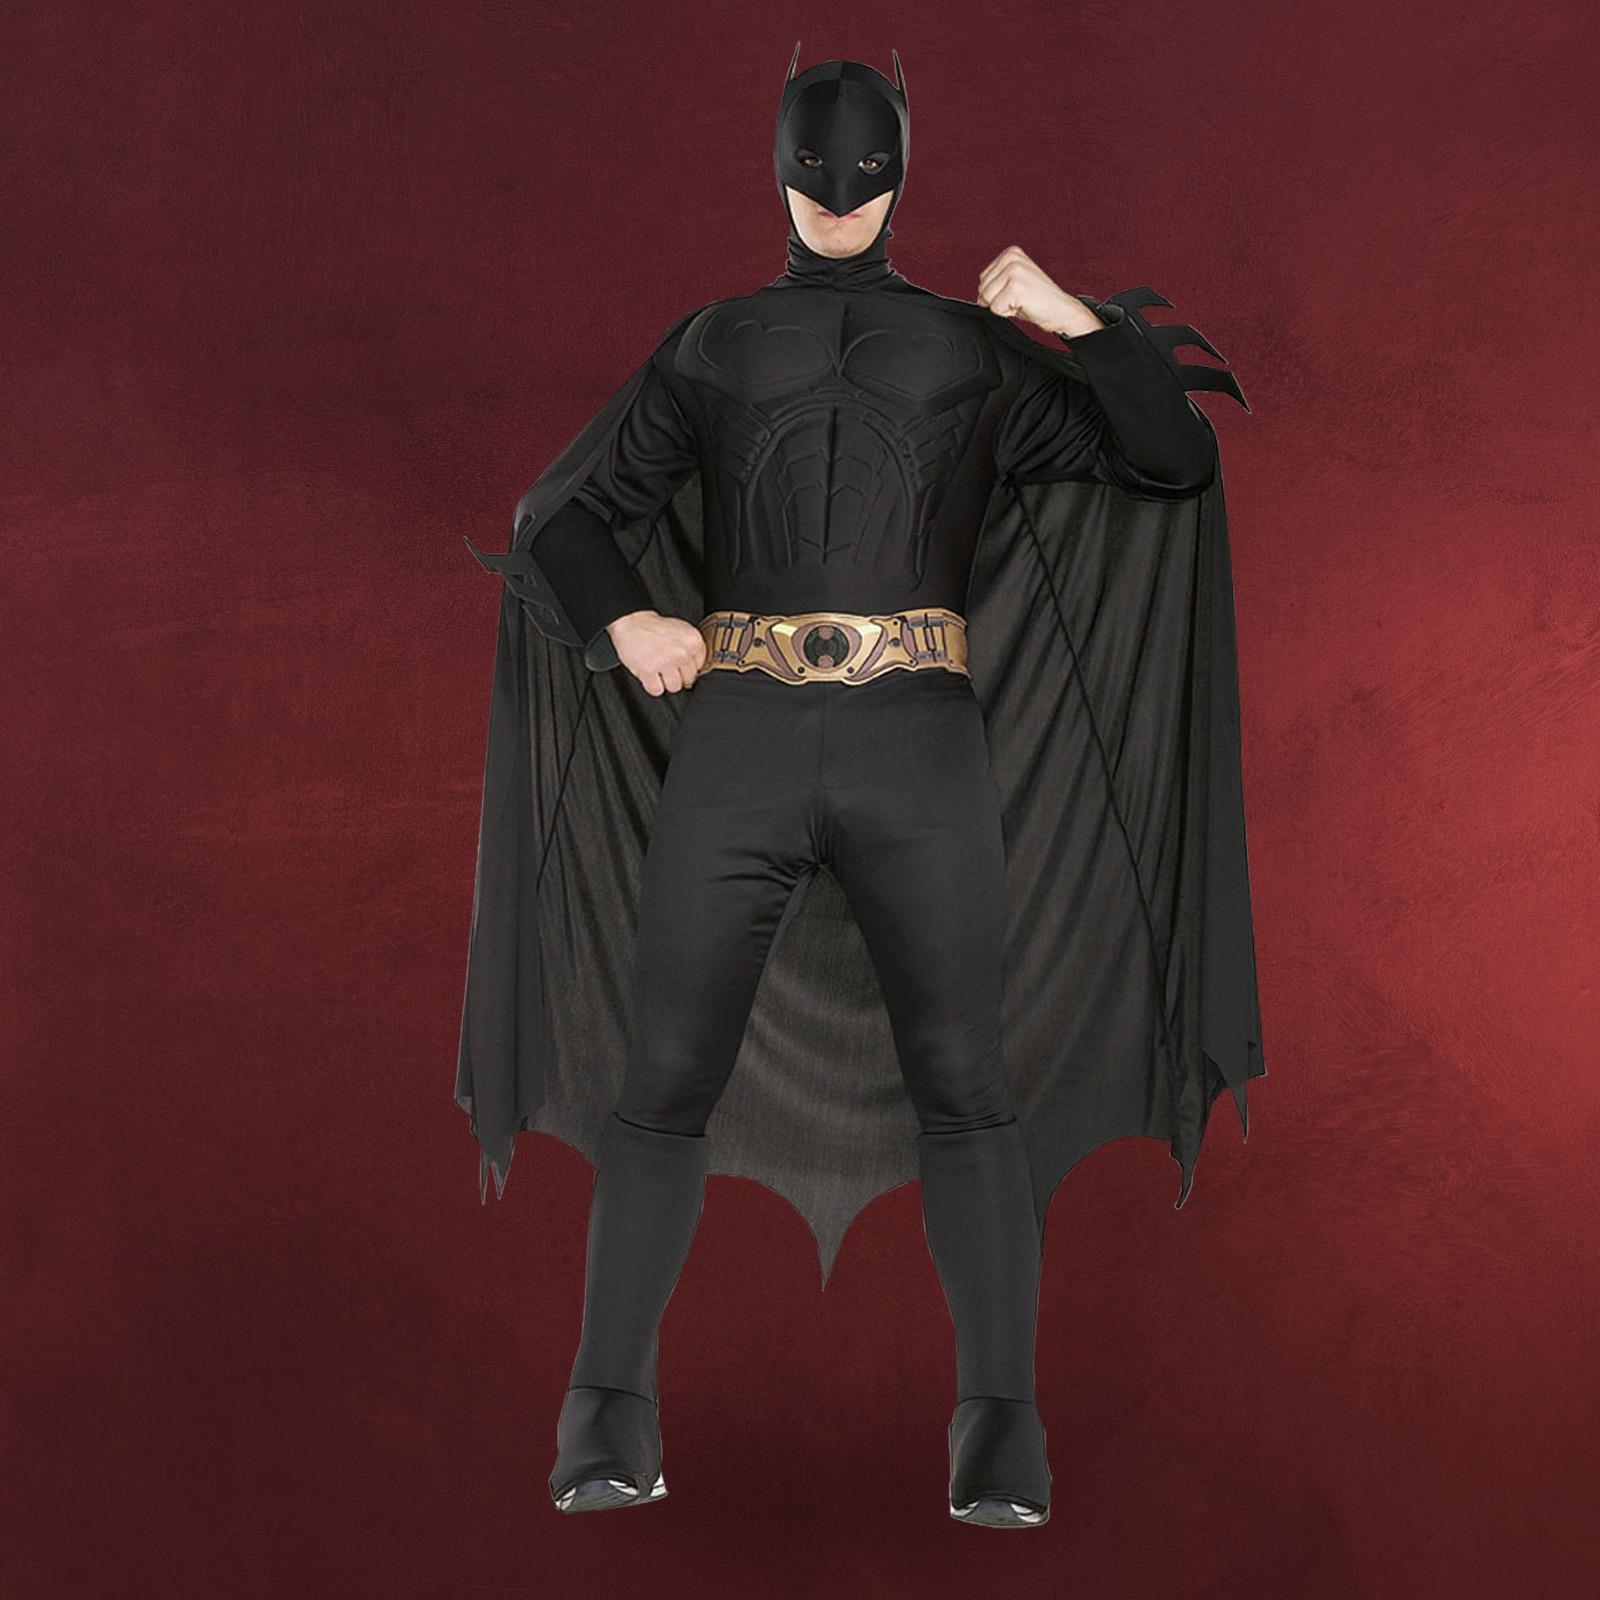 dark knight batman muskel kost m erwachsene 4 teilig ideal f r karneval ebay. Black Bedroom Furniture Sets. Home Design Ideas